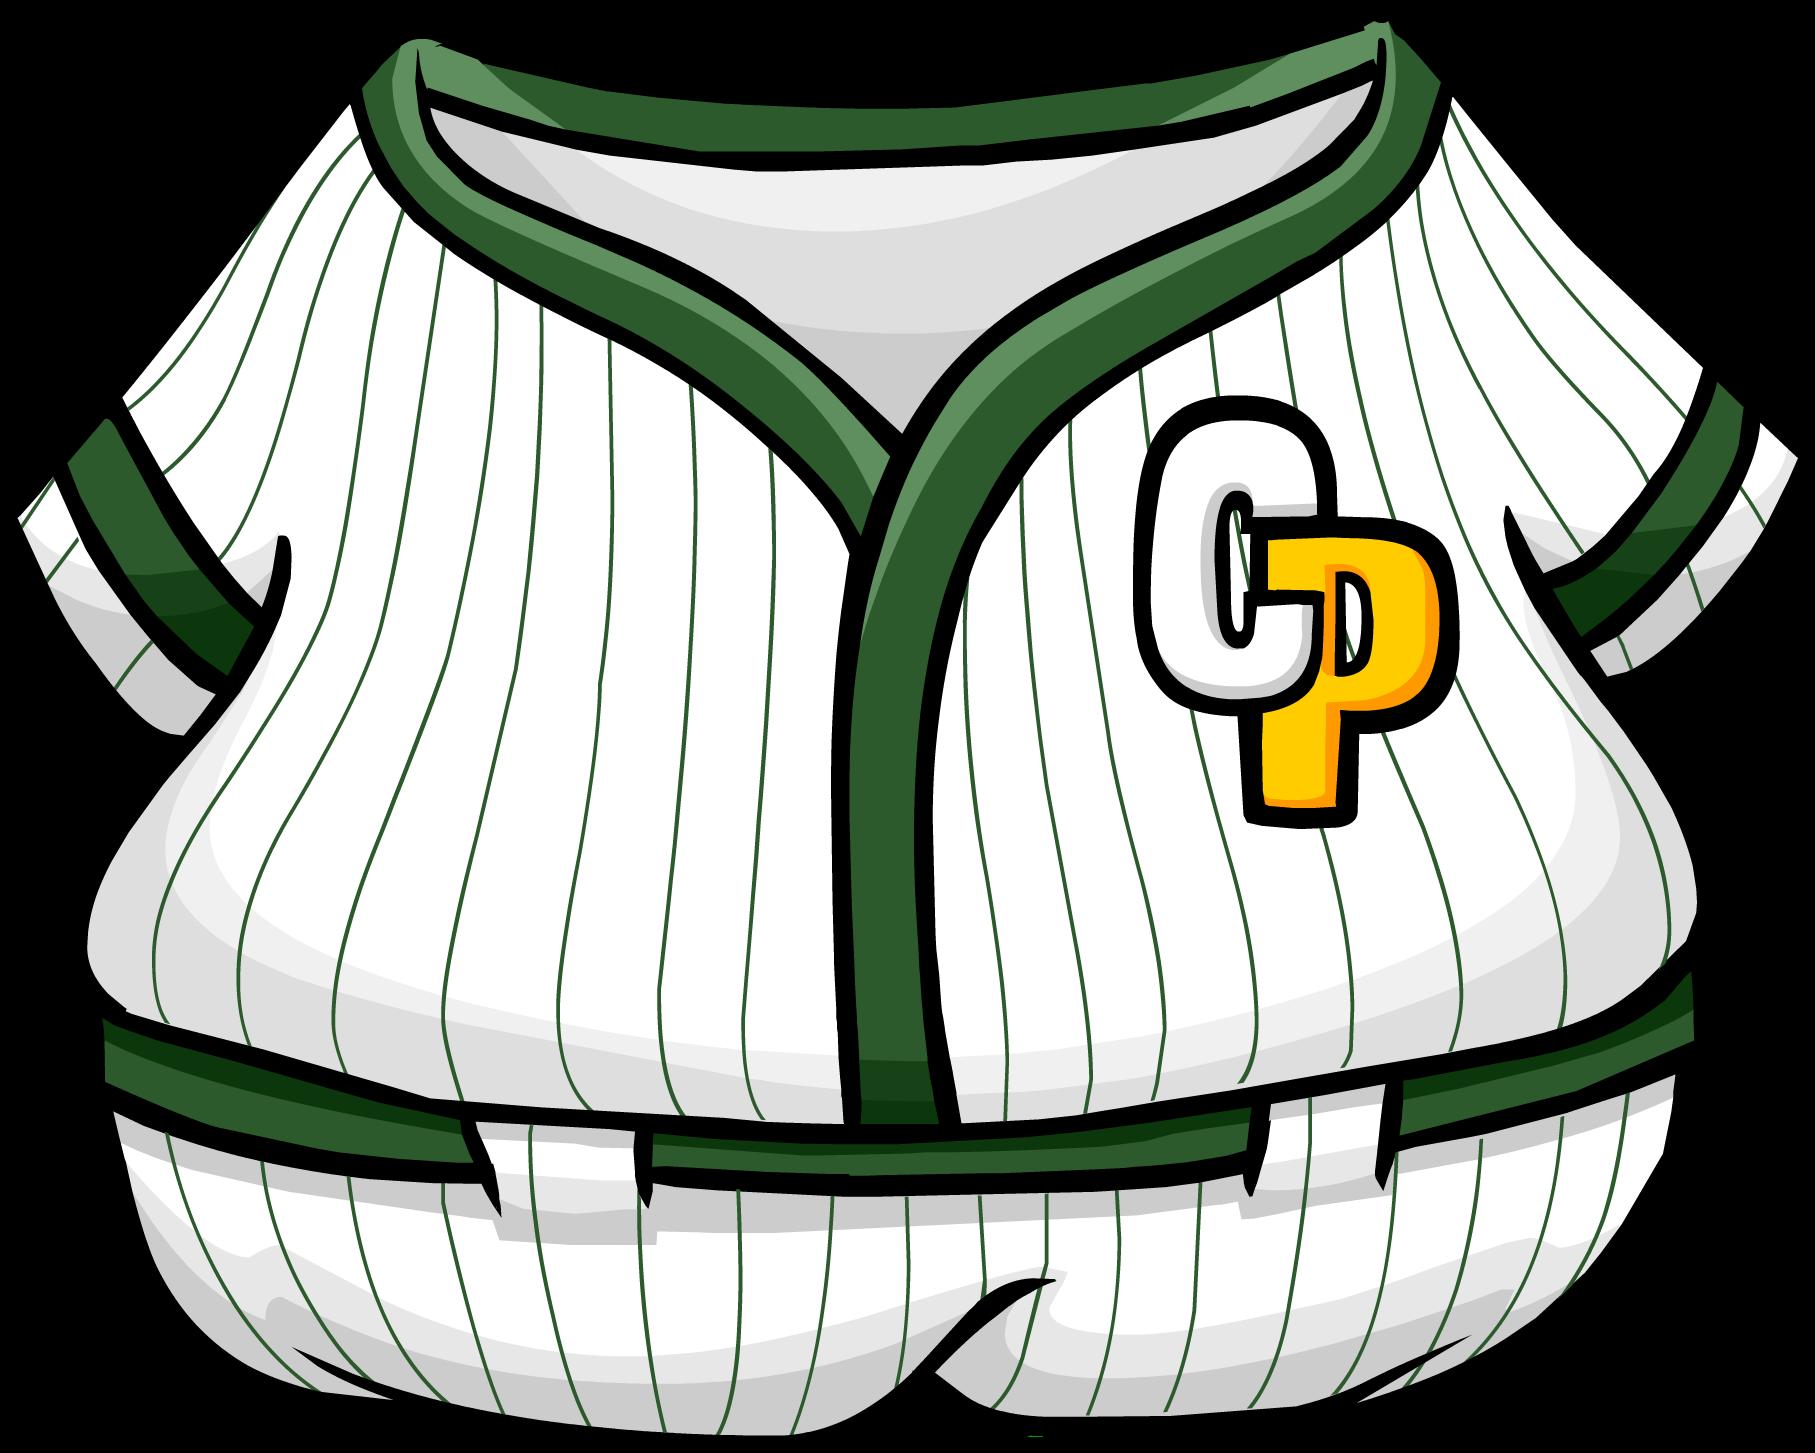 Baseball game on tv clipart clip freeuse Green Baseball Uniform | Club Penguin Wiki | FANDOM powered by Wikia clip freeuse